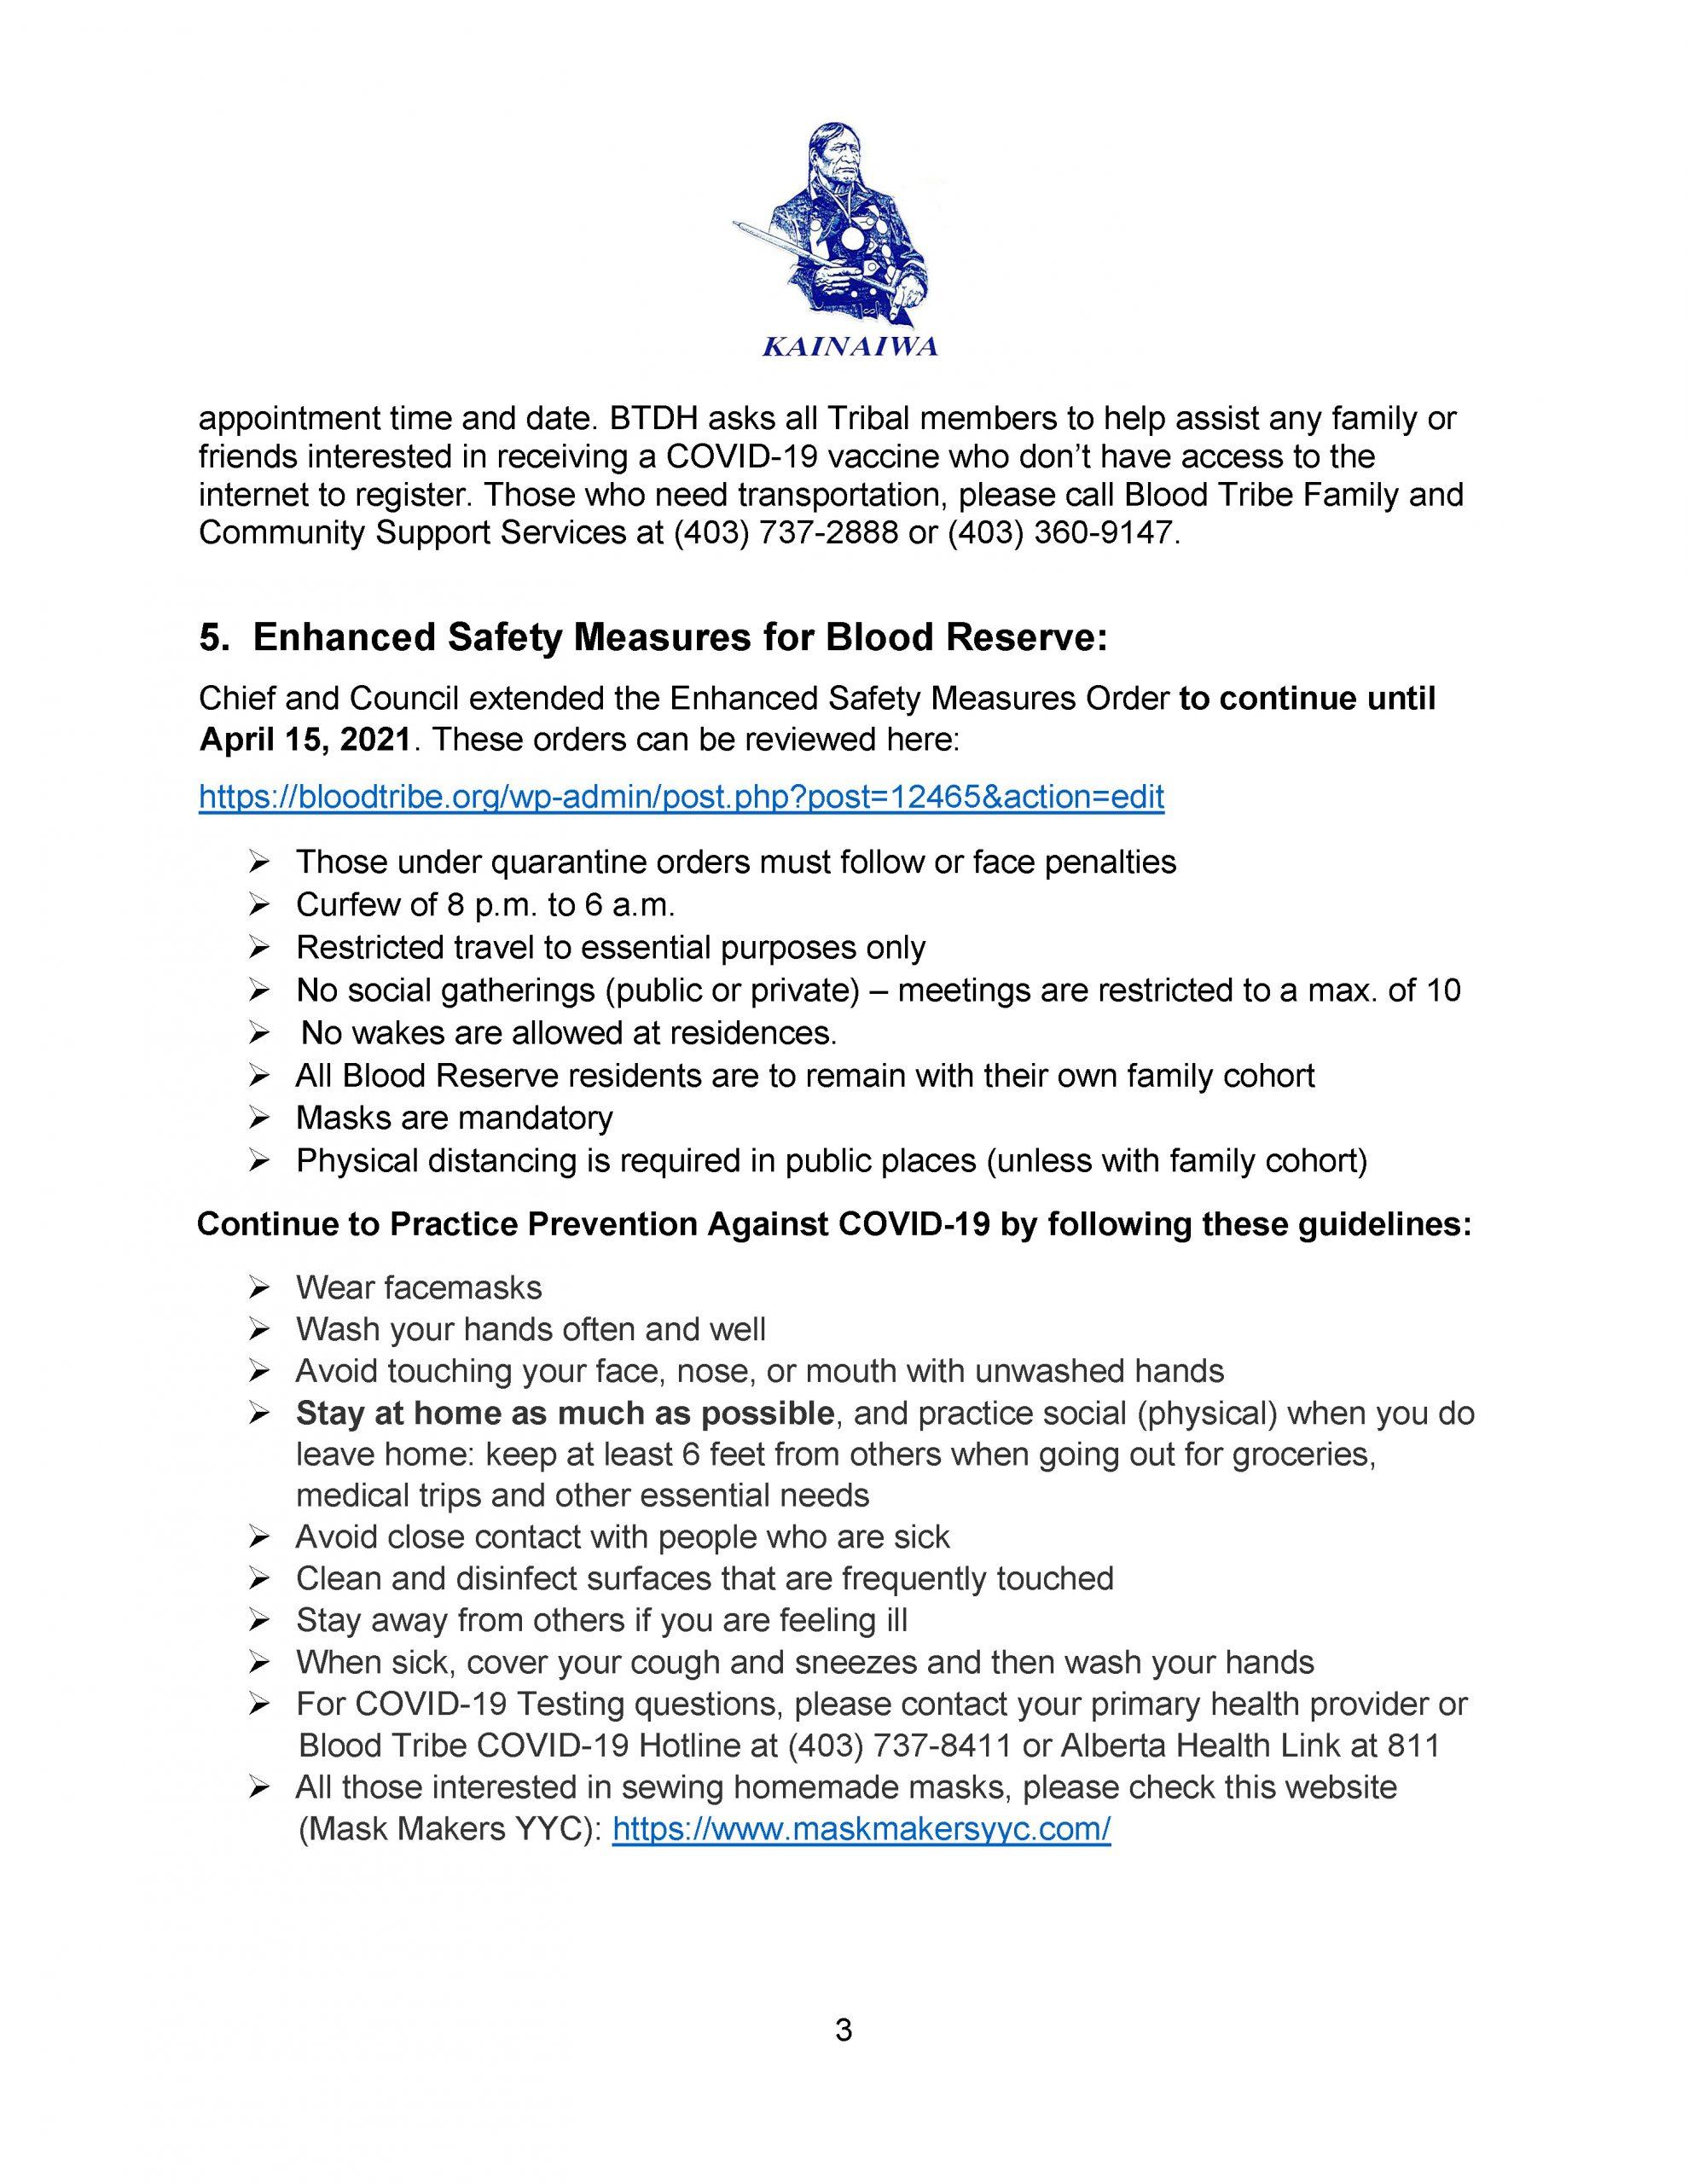 Blood Tribe COVID-19 Response Bulletin – (April 9, 2021) - Page 3